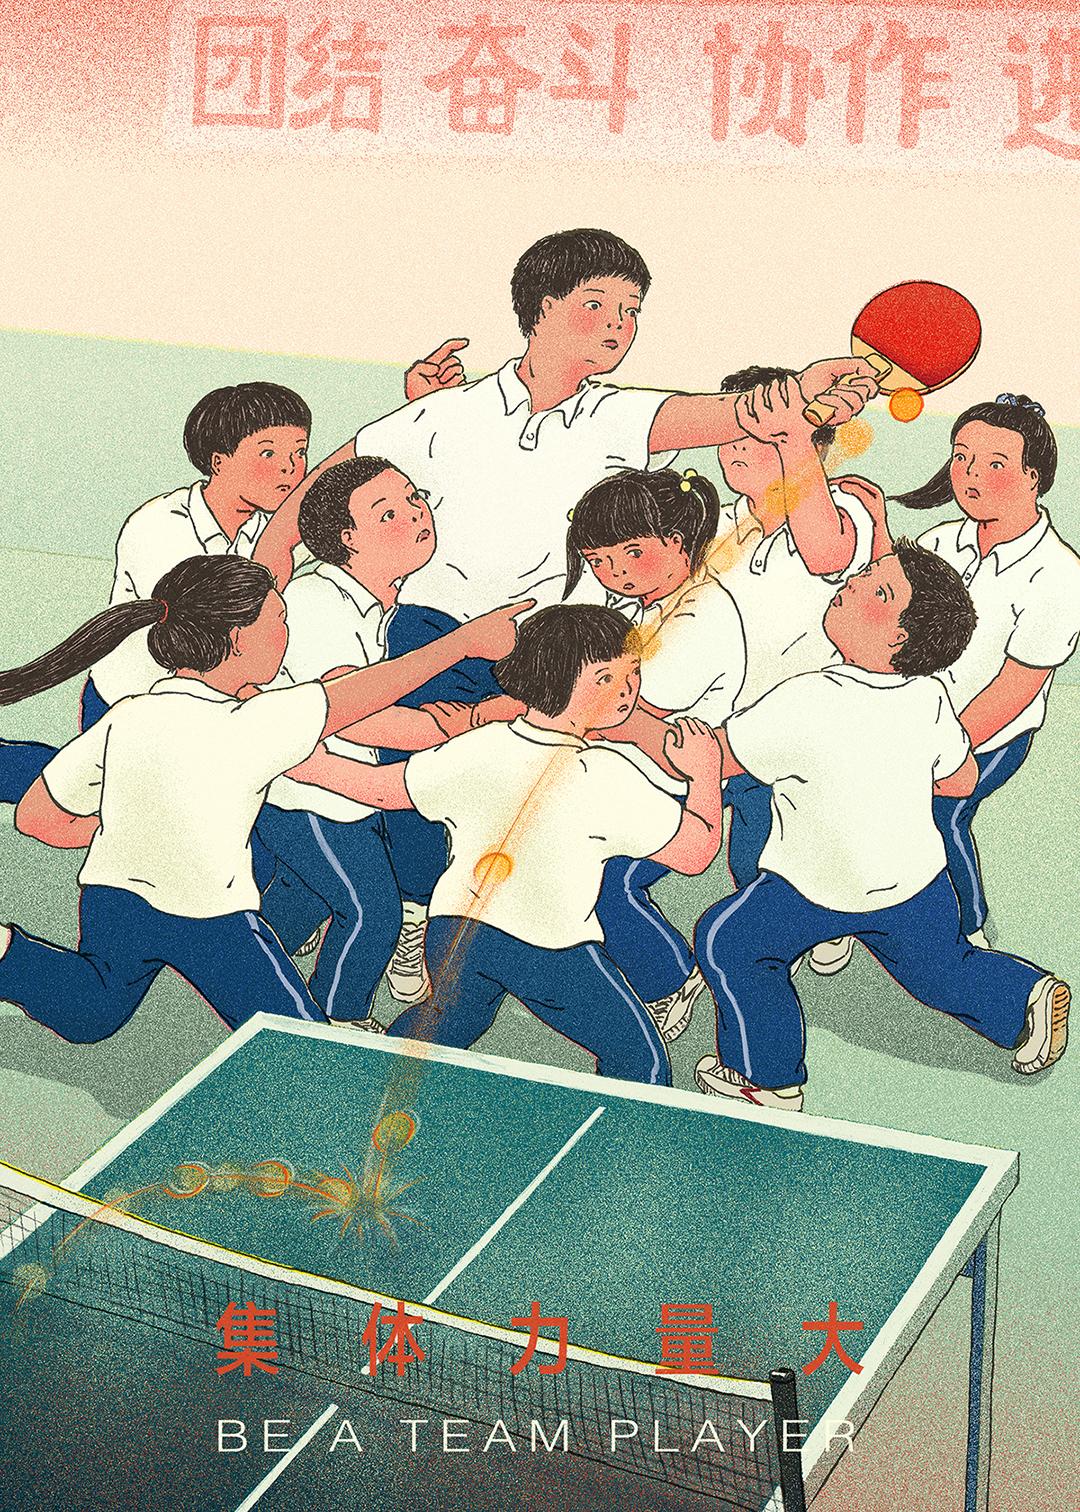 GirlsclubAsia-Xinmei-Liu-teamplayer